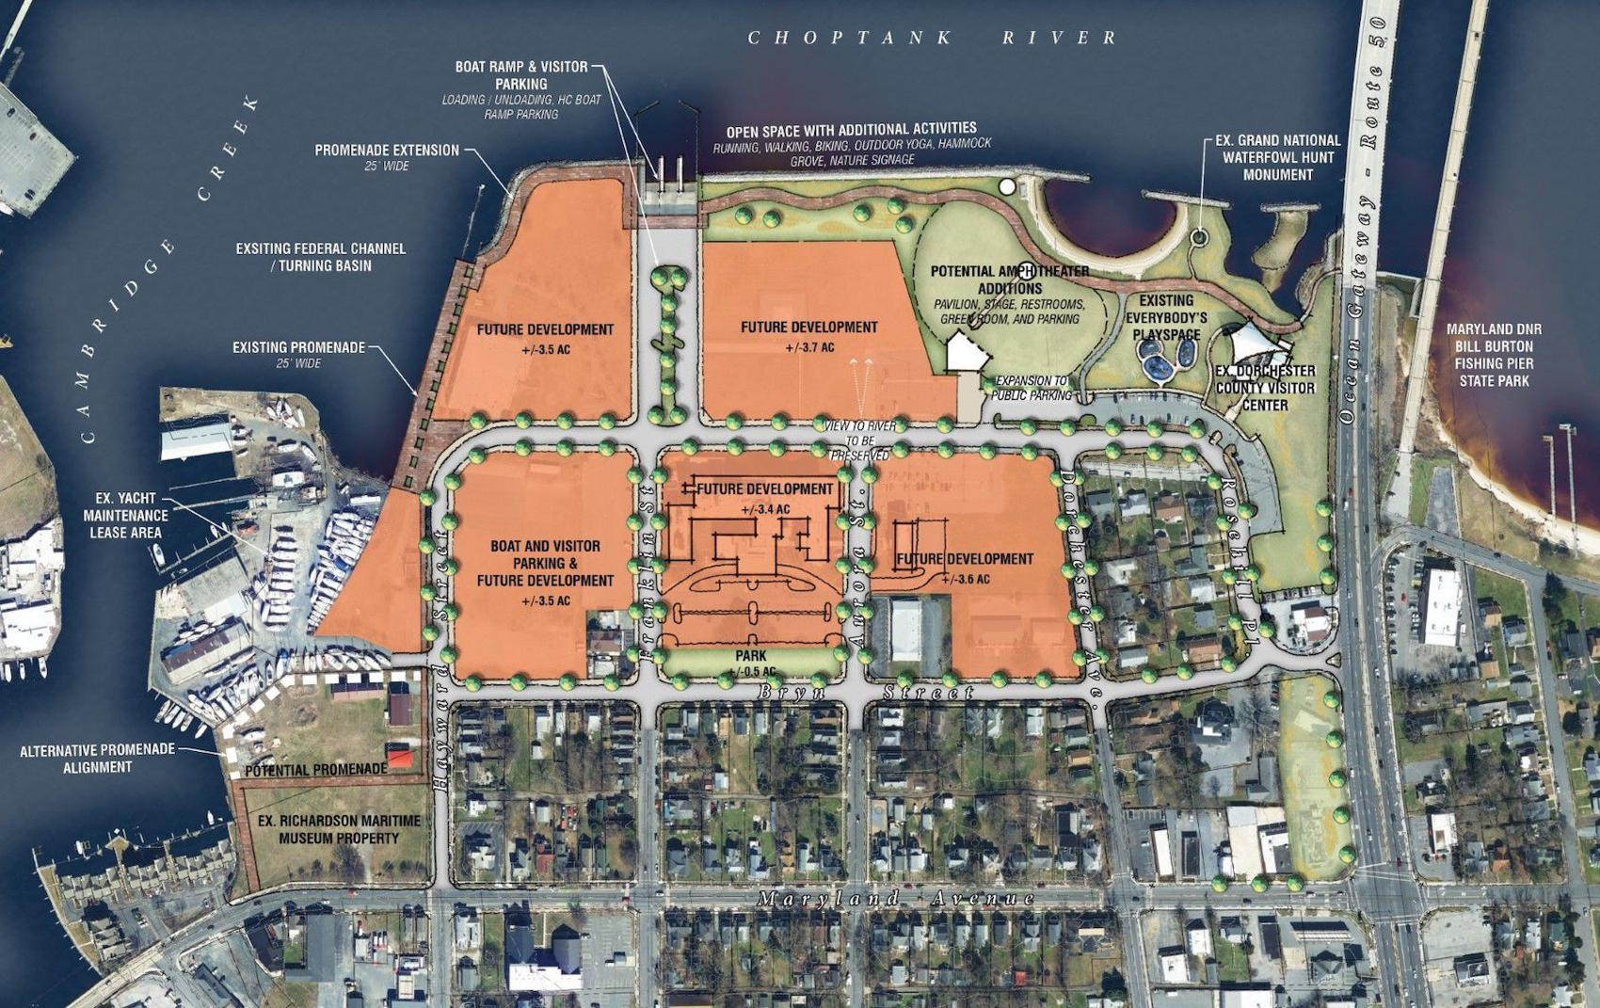 Cambridge Waterfront Development Site Plan